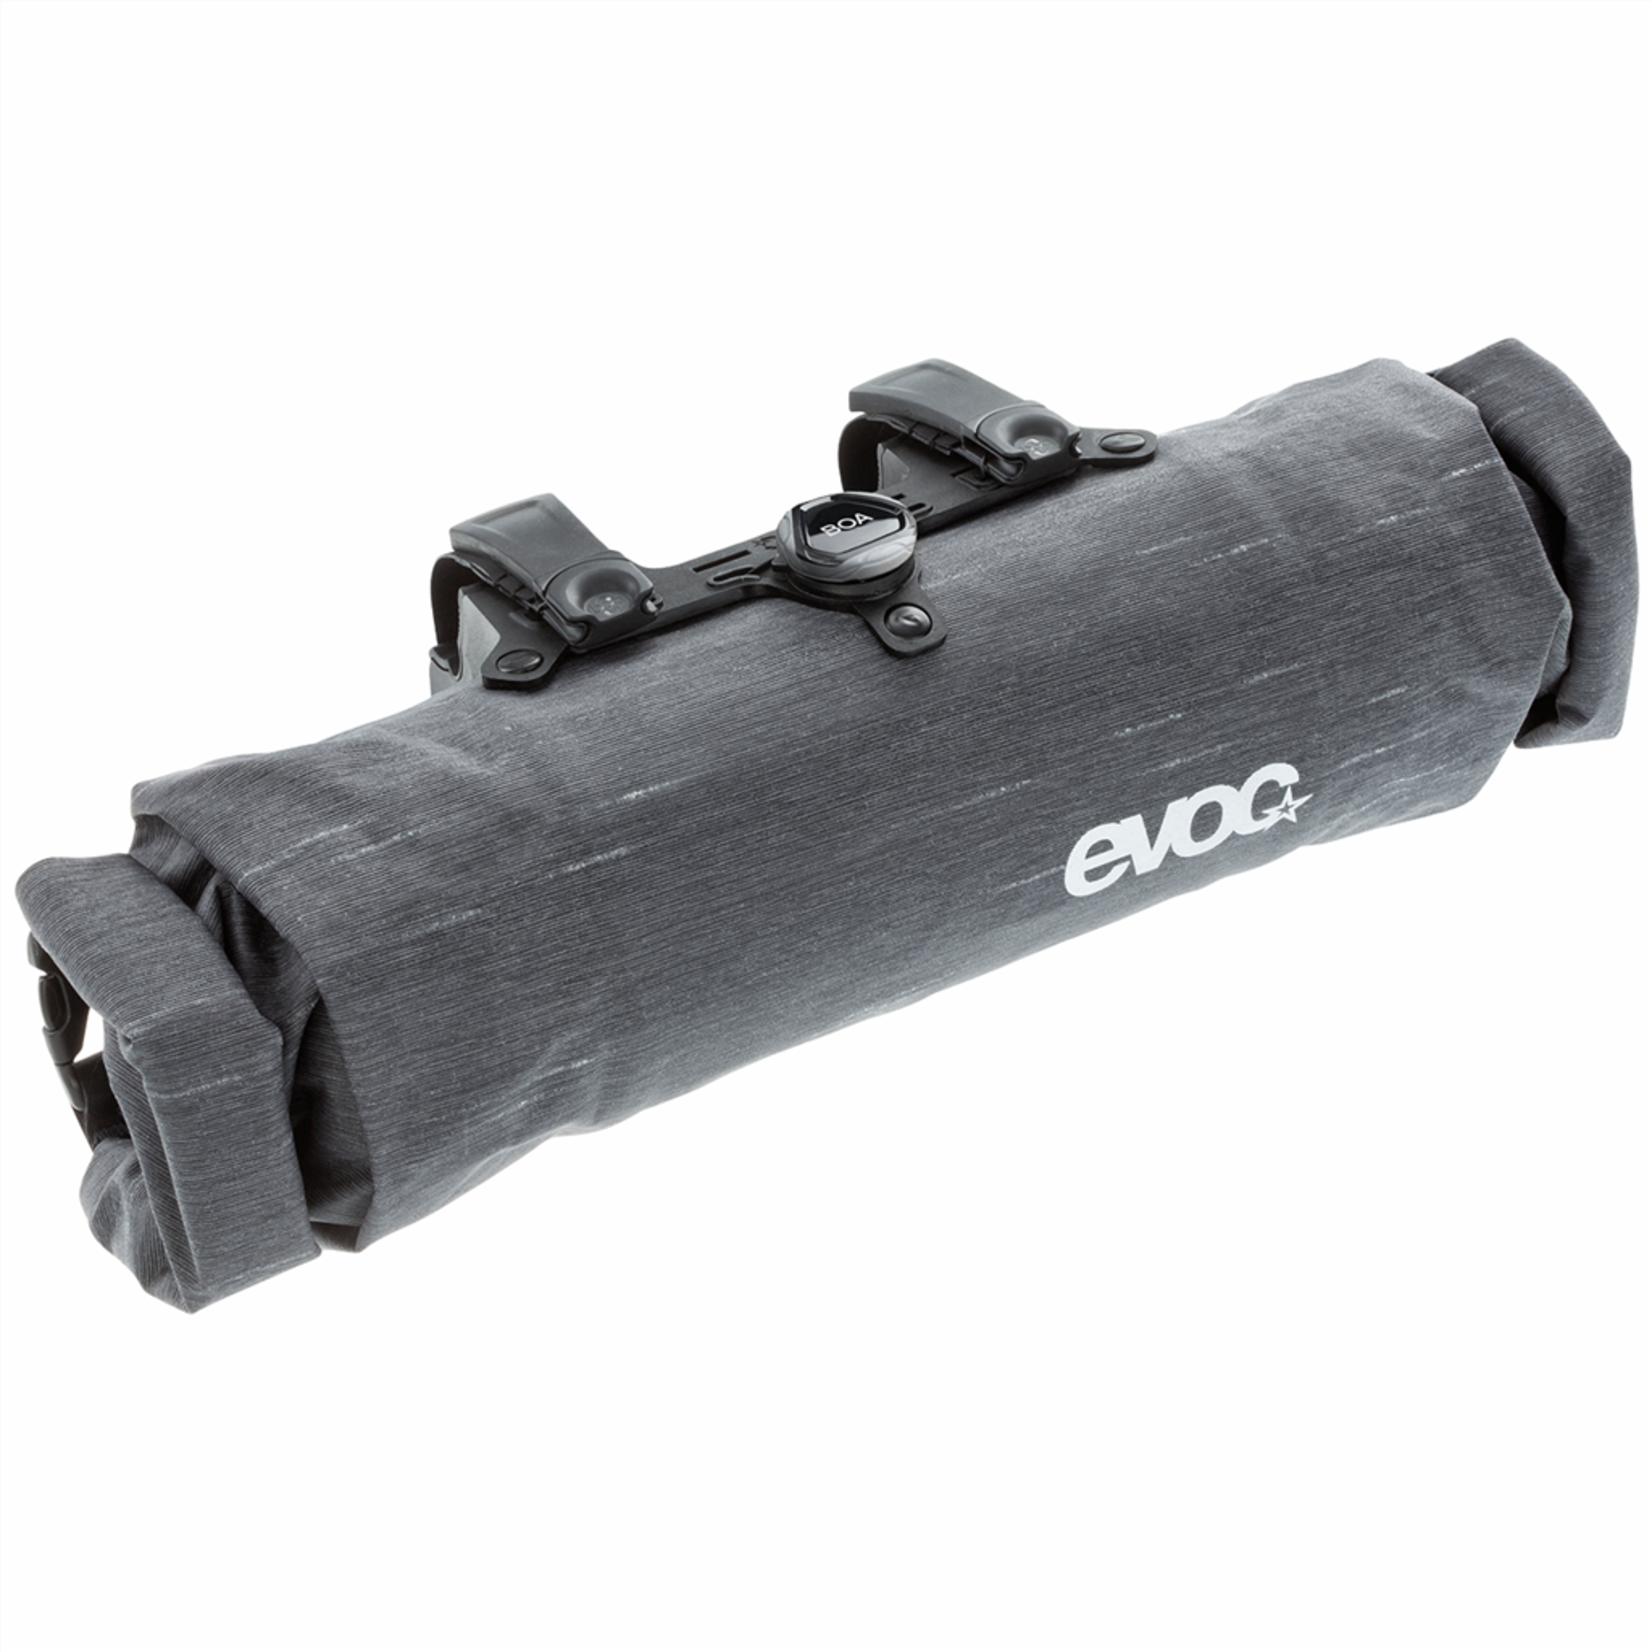 EVOC Tasche manubrio EVOC Handlebar Pack Boa 2.5L - carbon grey